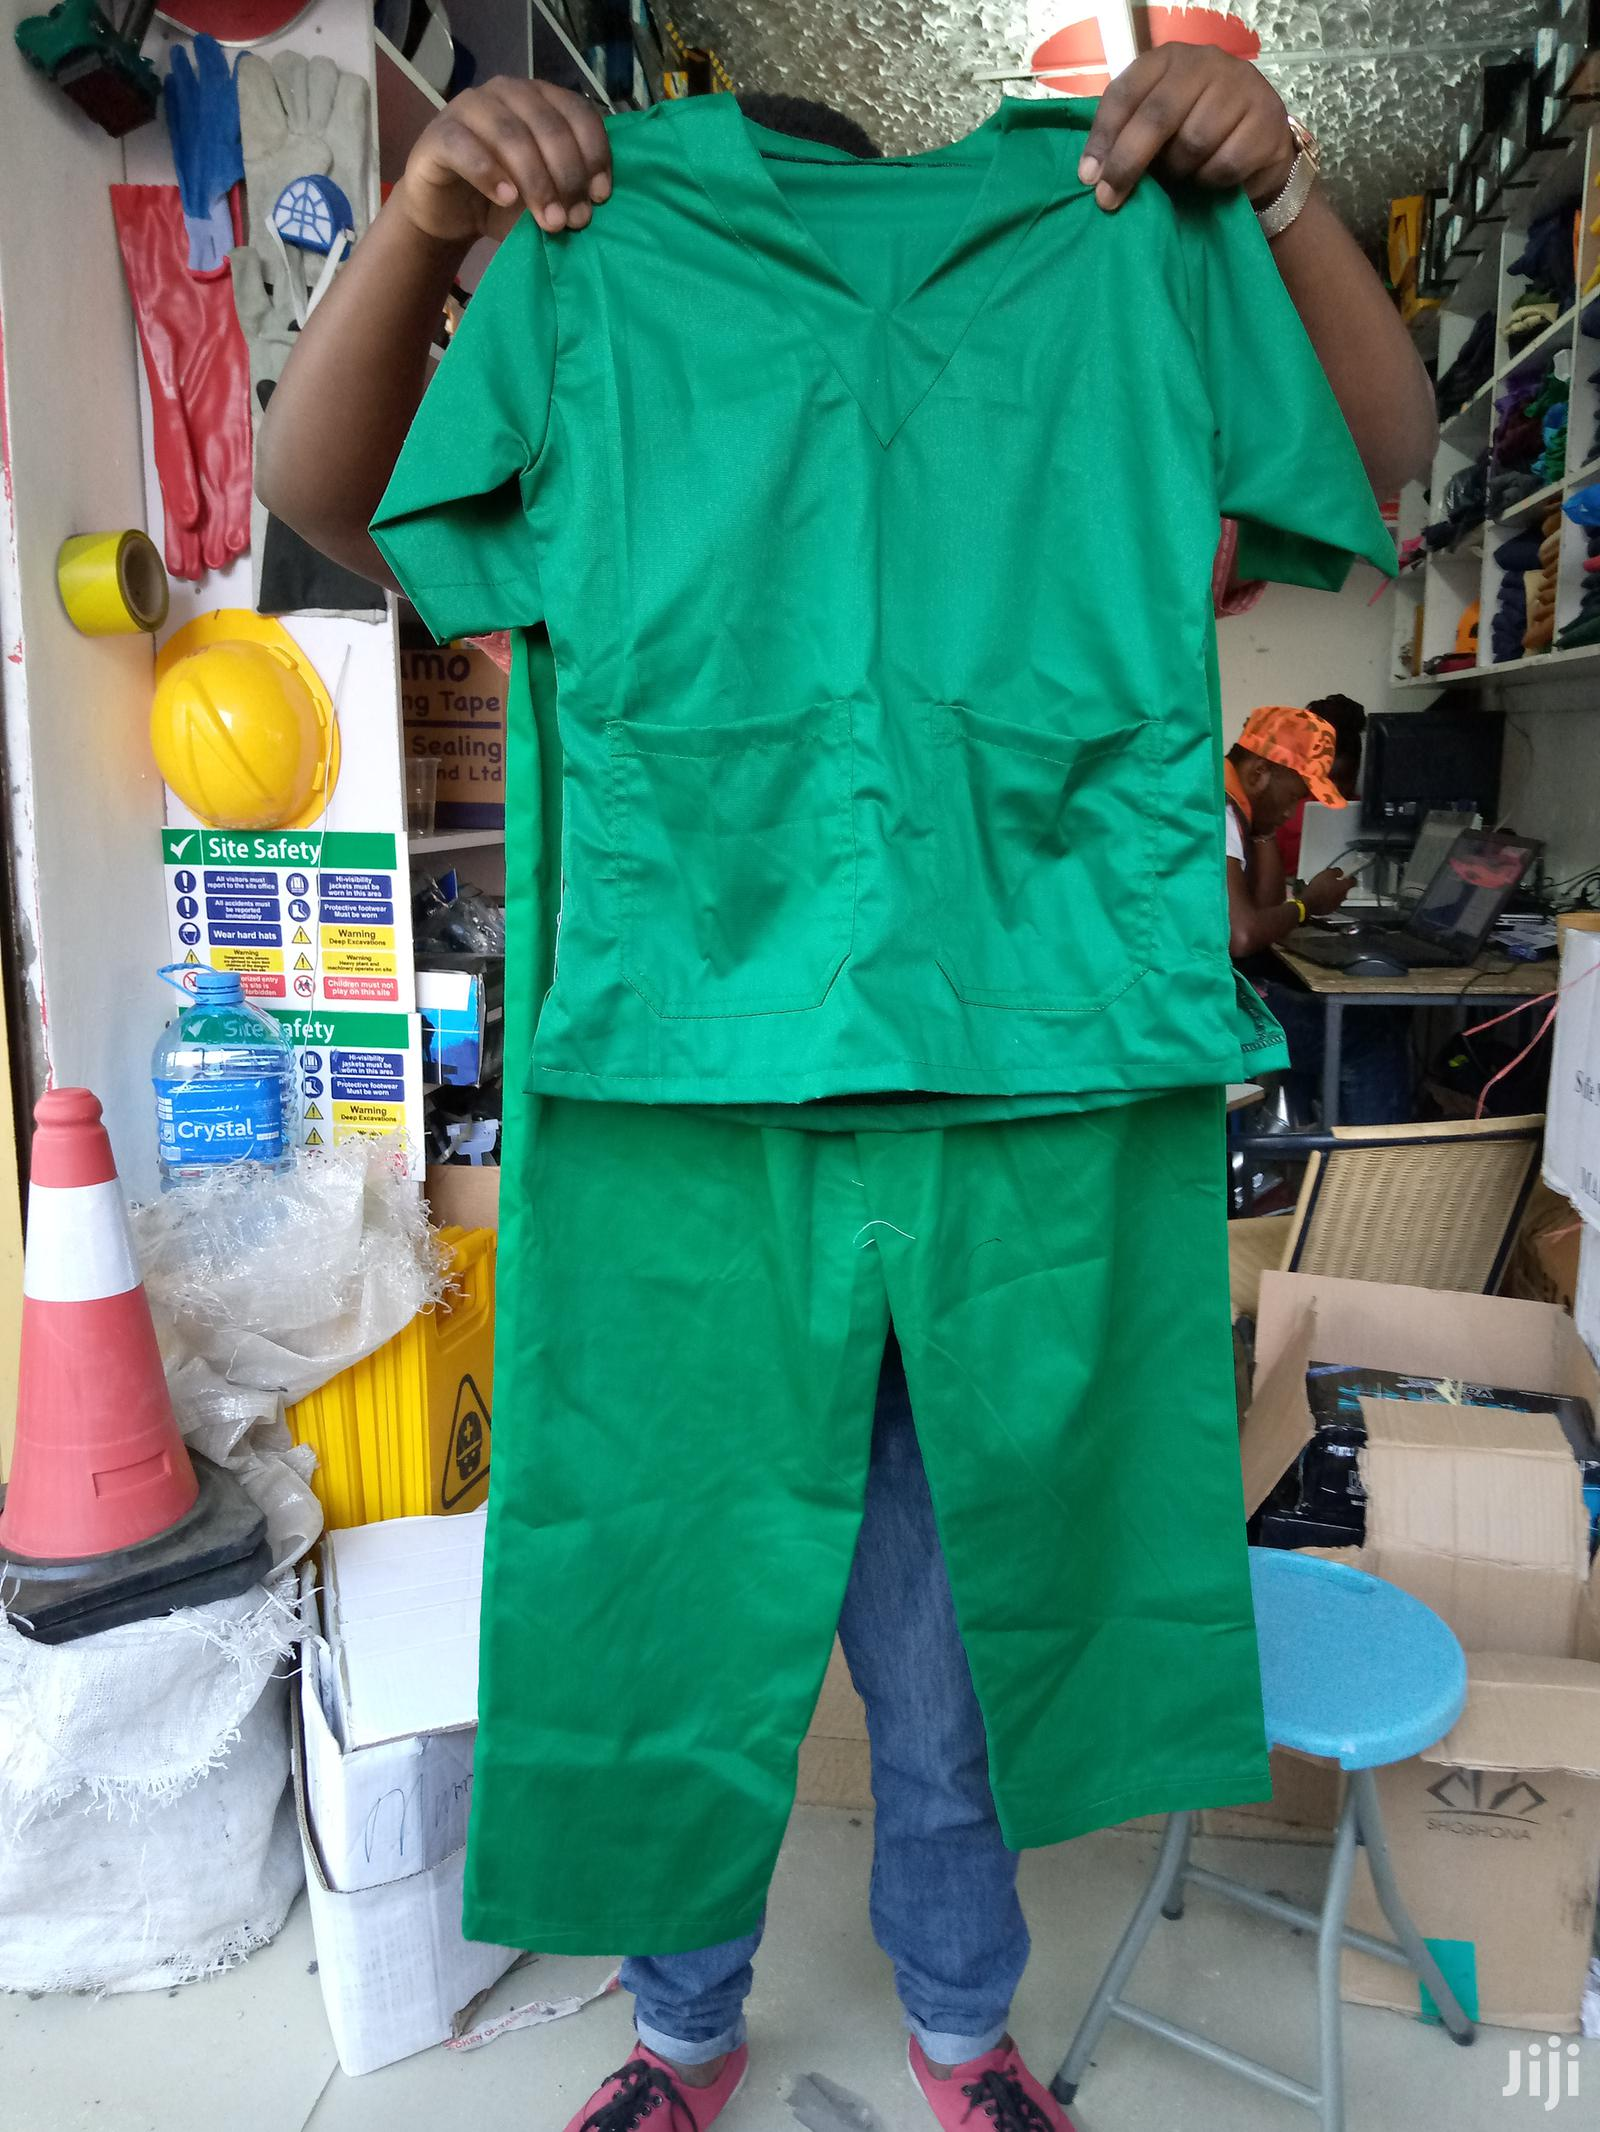 Medical Scrubs For Sale | Clothing for sale in Nairobi Central, Nairobi, Kenya